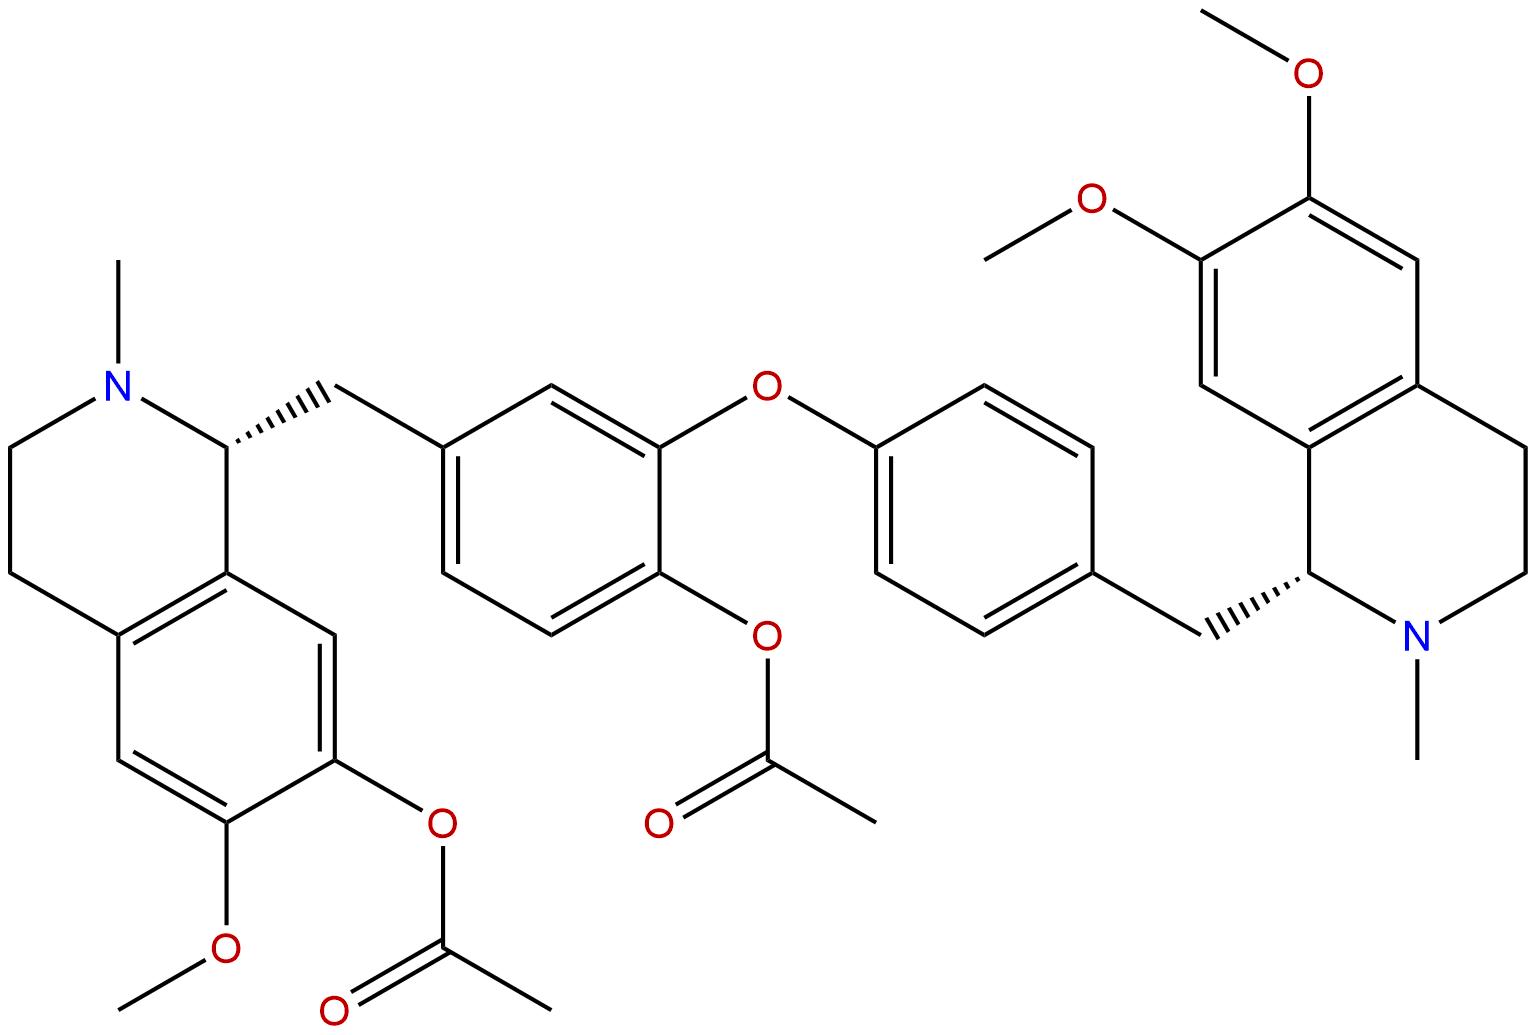 Di-O-acetyldaurisoline